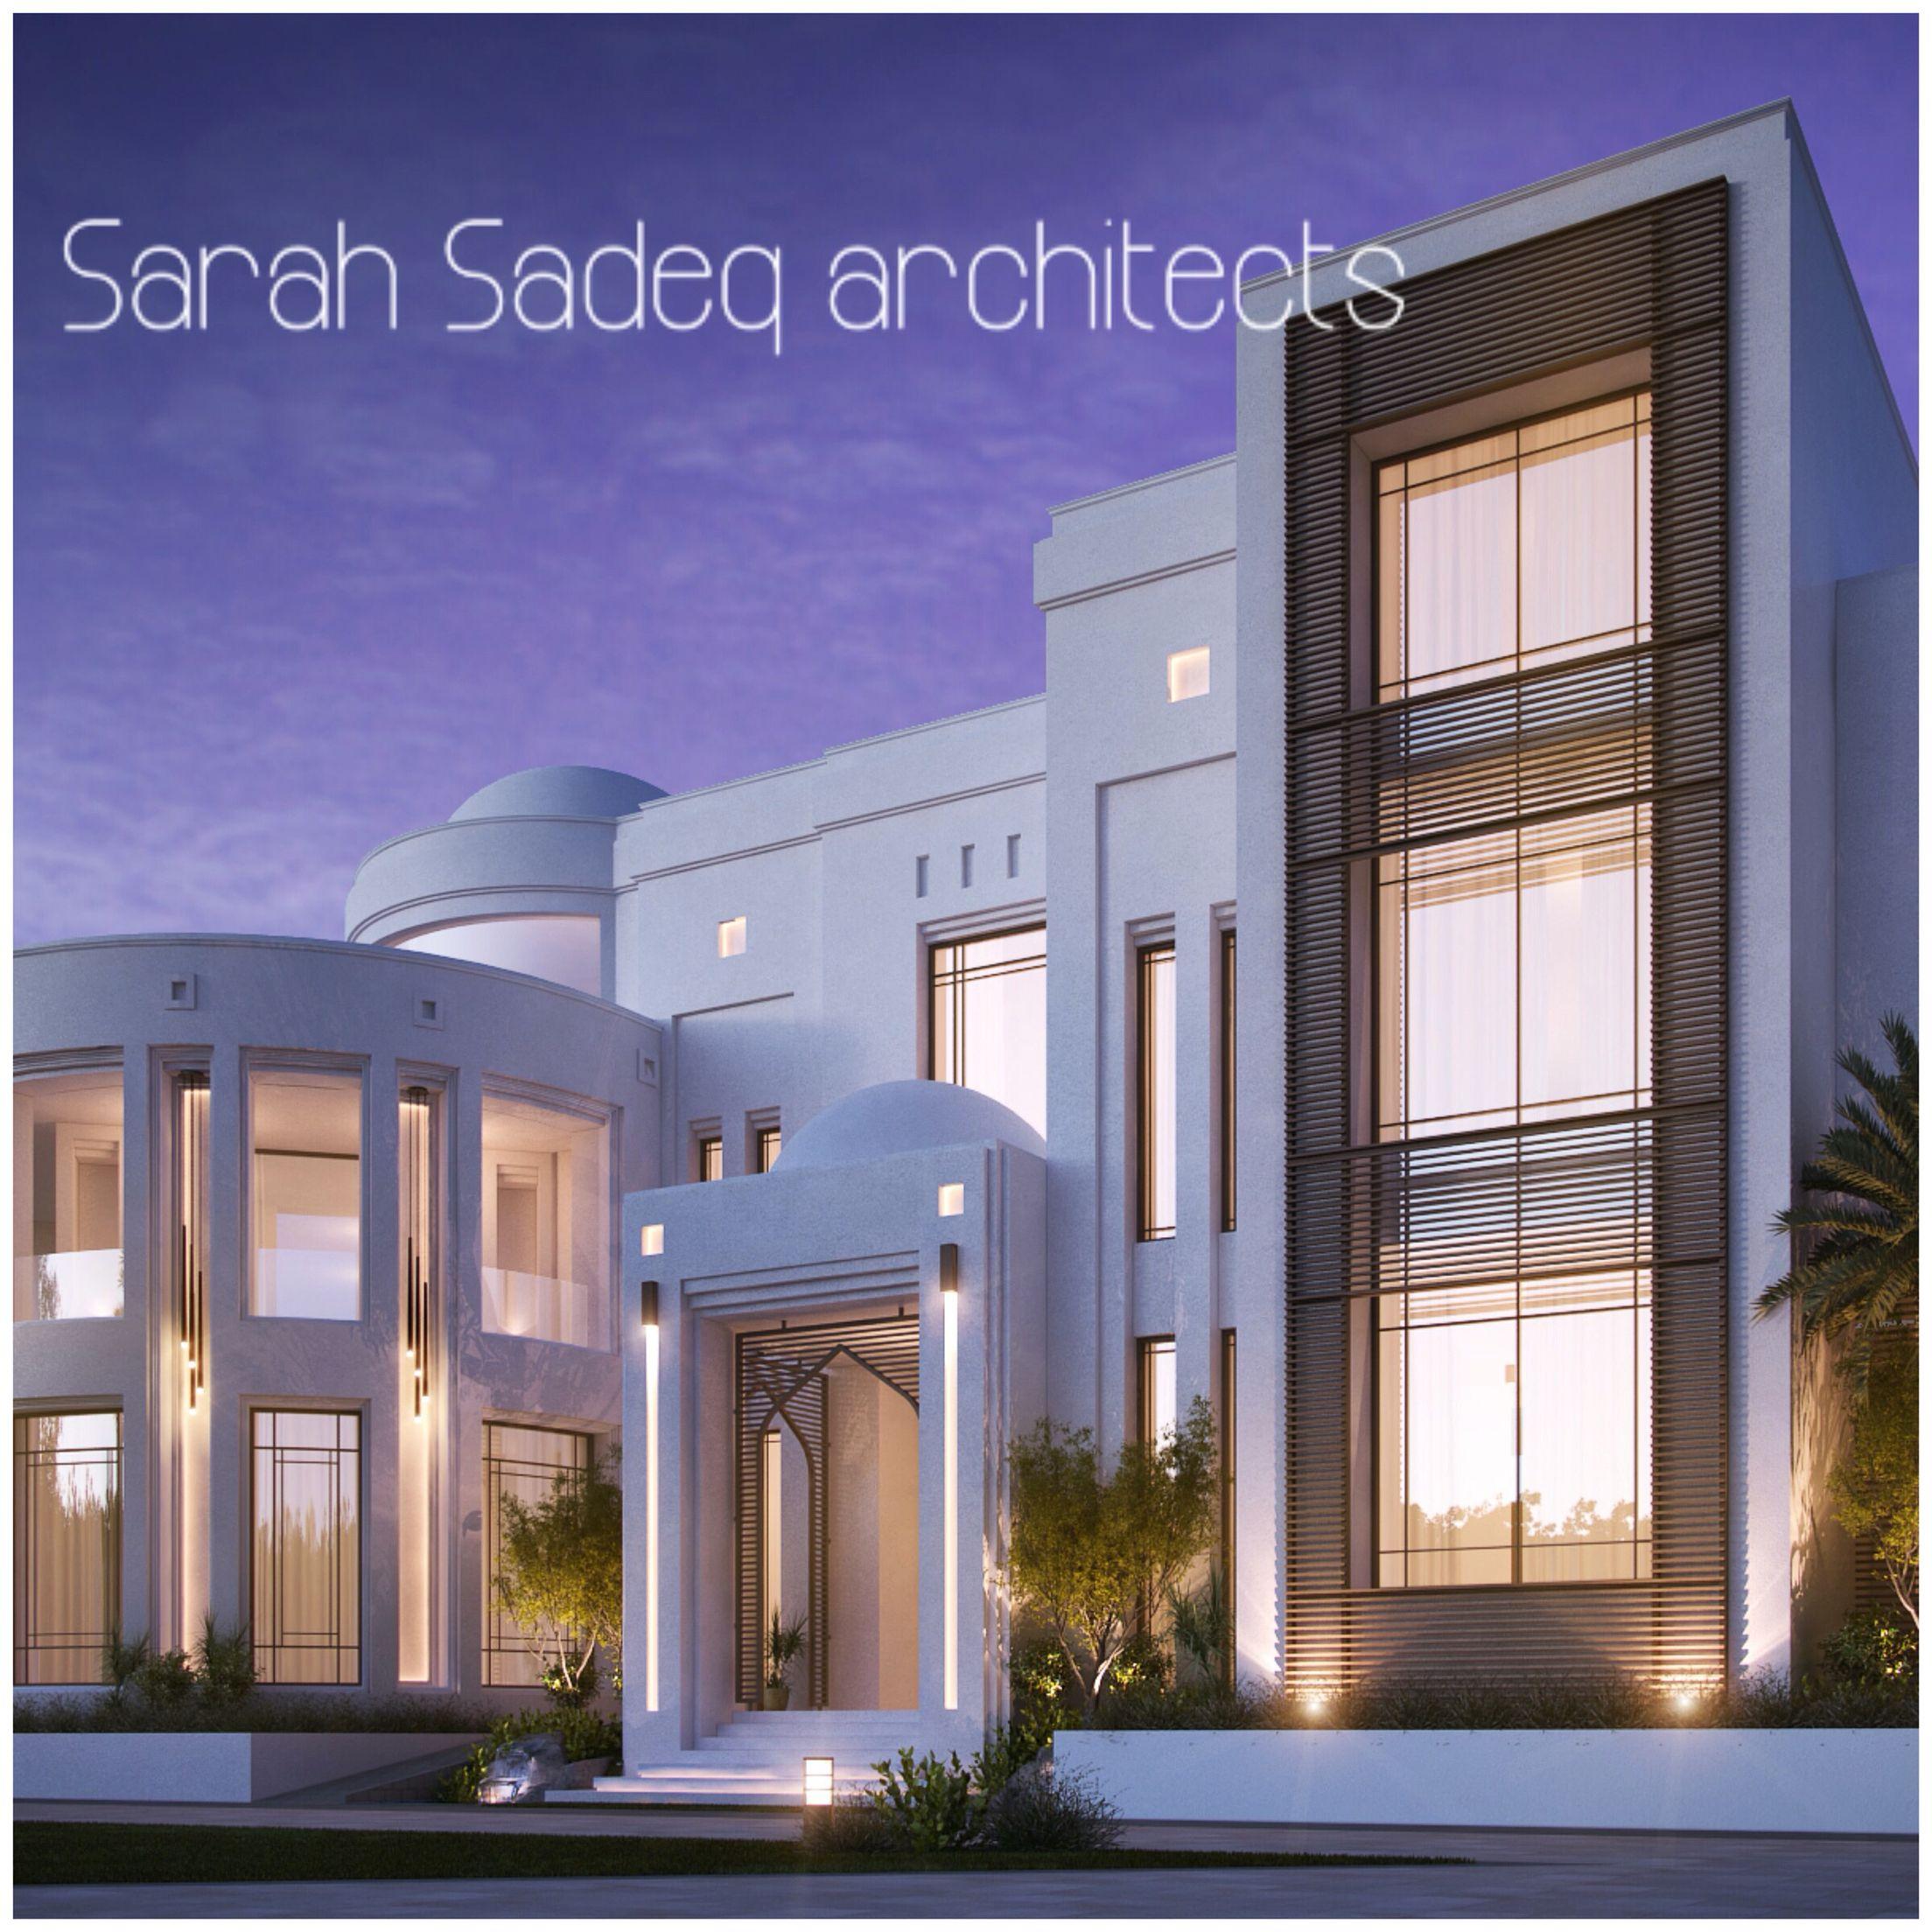 2000 m private villa kuwait sarah sadeq architectes pinterest villas architecture and. Black Bedroom Furniture Sets. Home Design Ideas